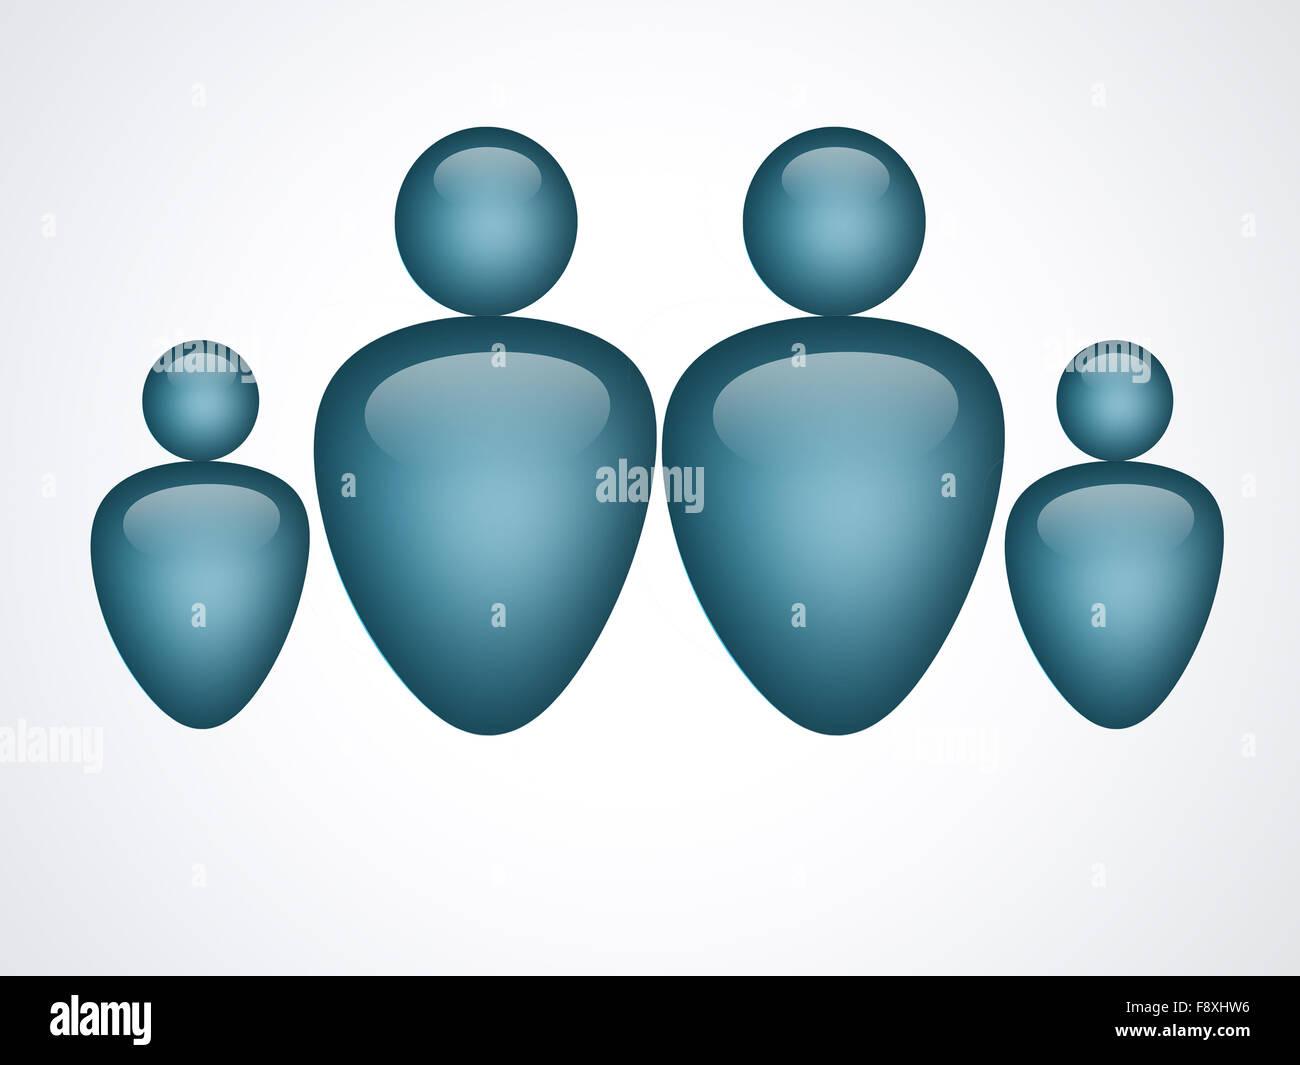 family - Stock Image